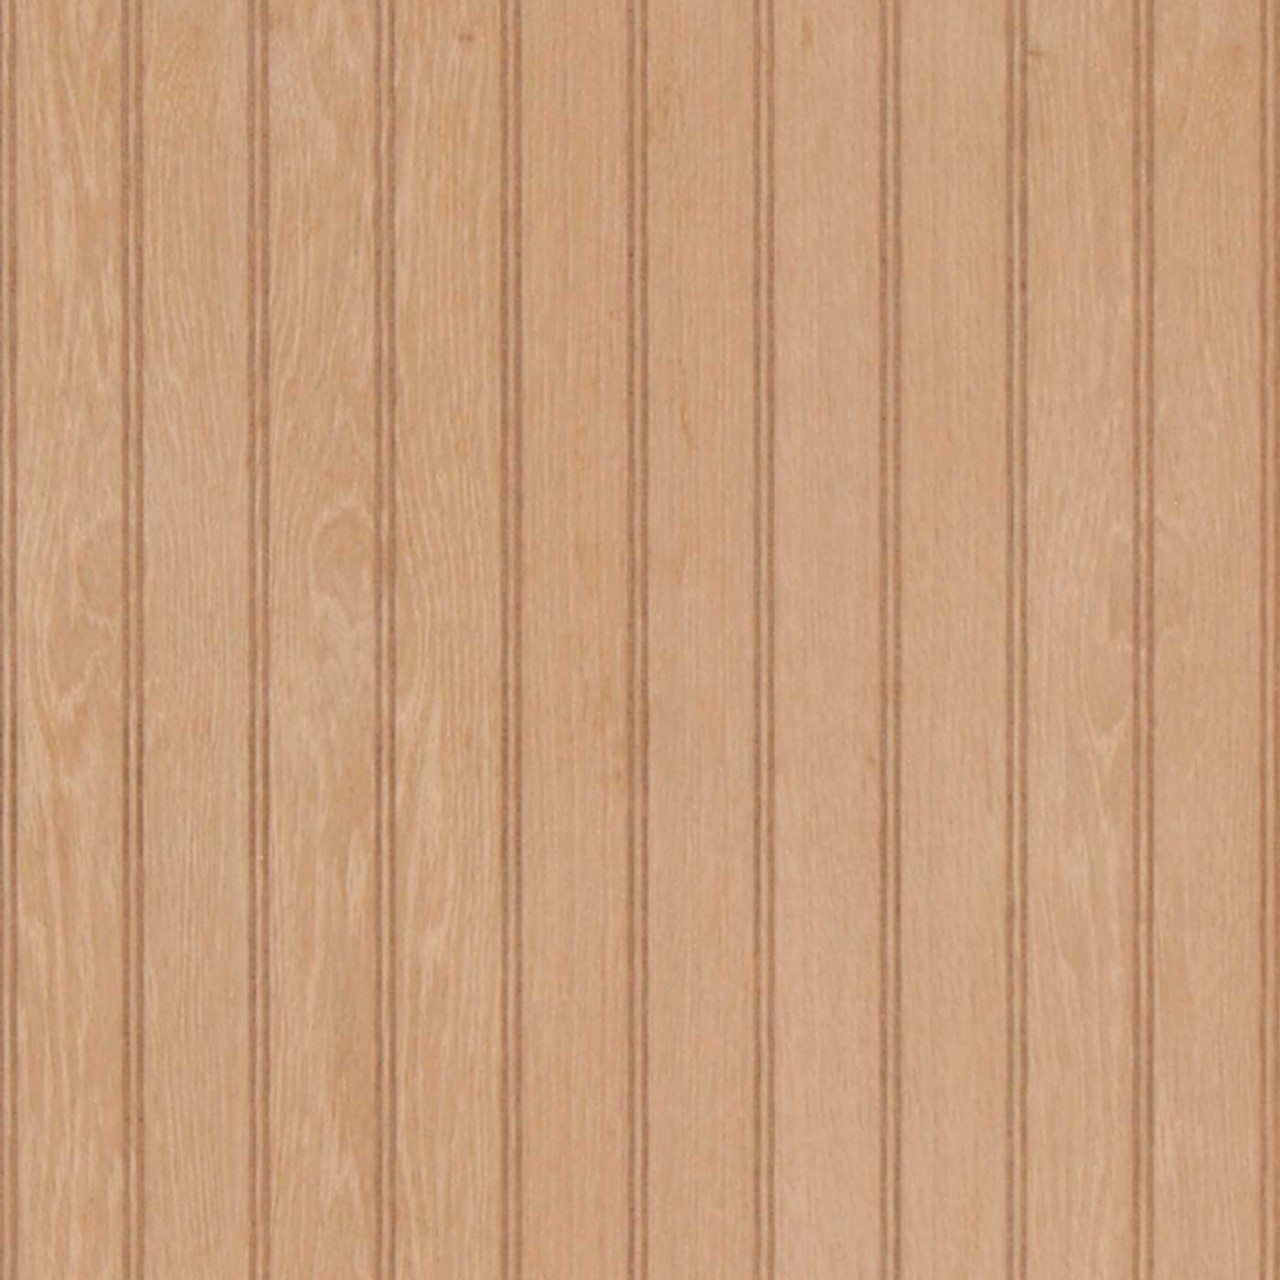 Unfinished Red Oak Veneer 2-inch